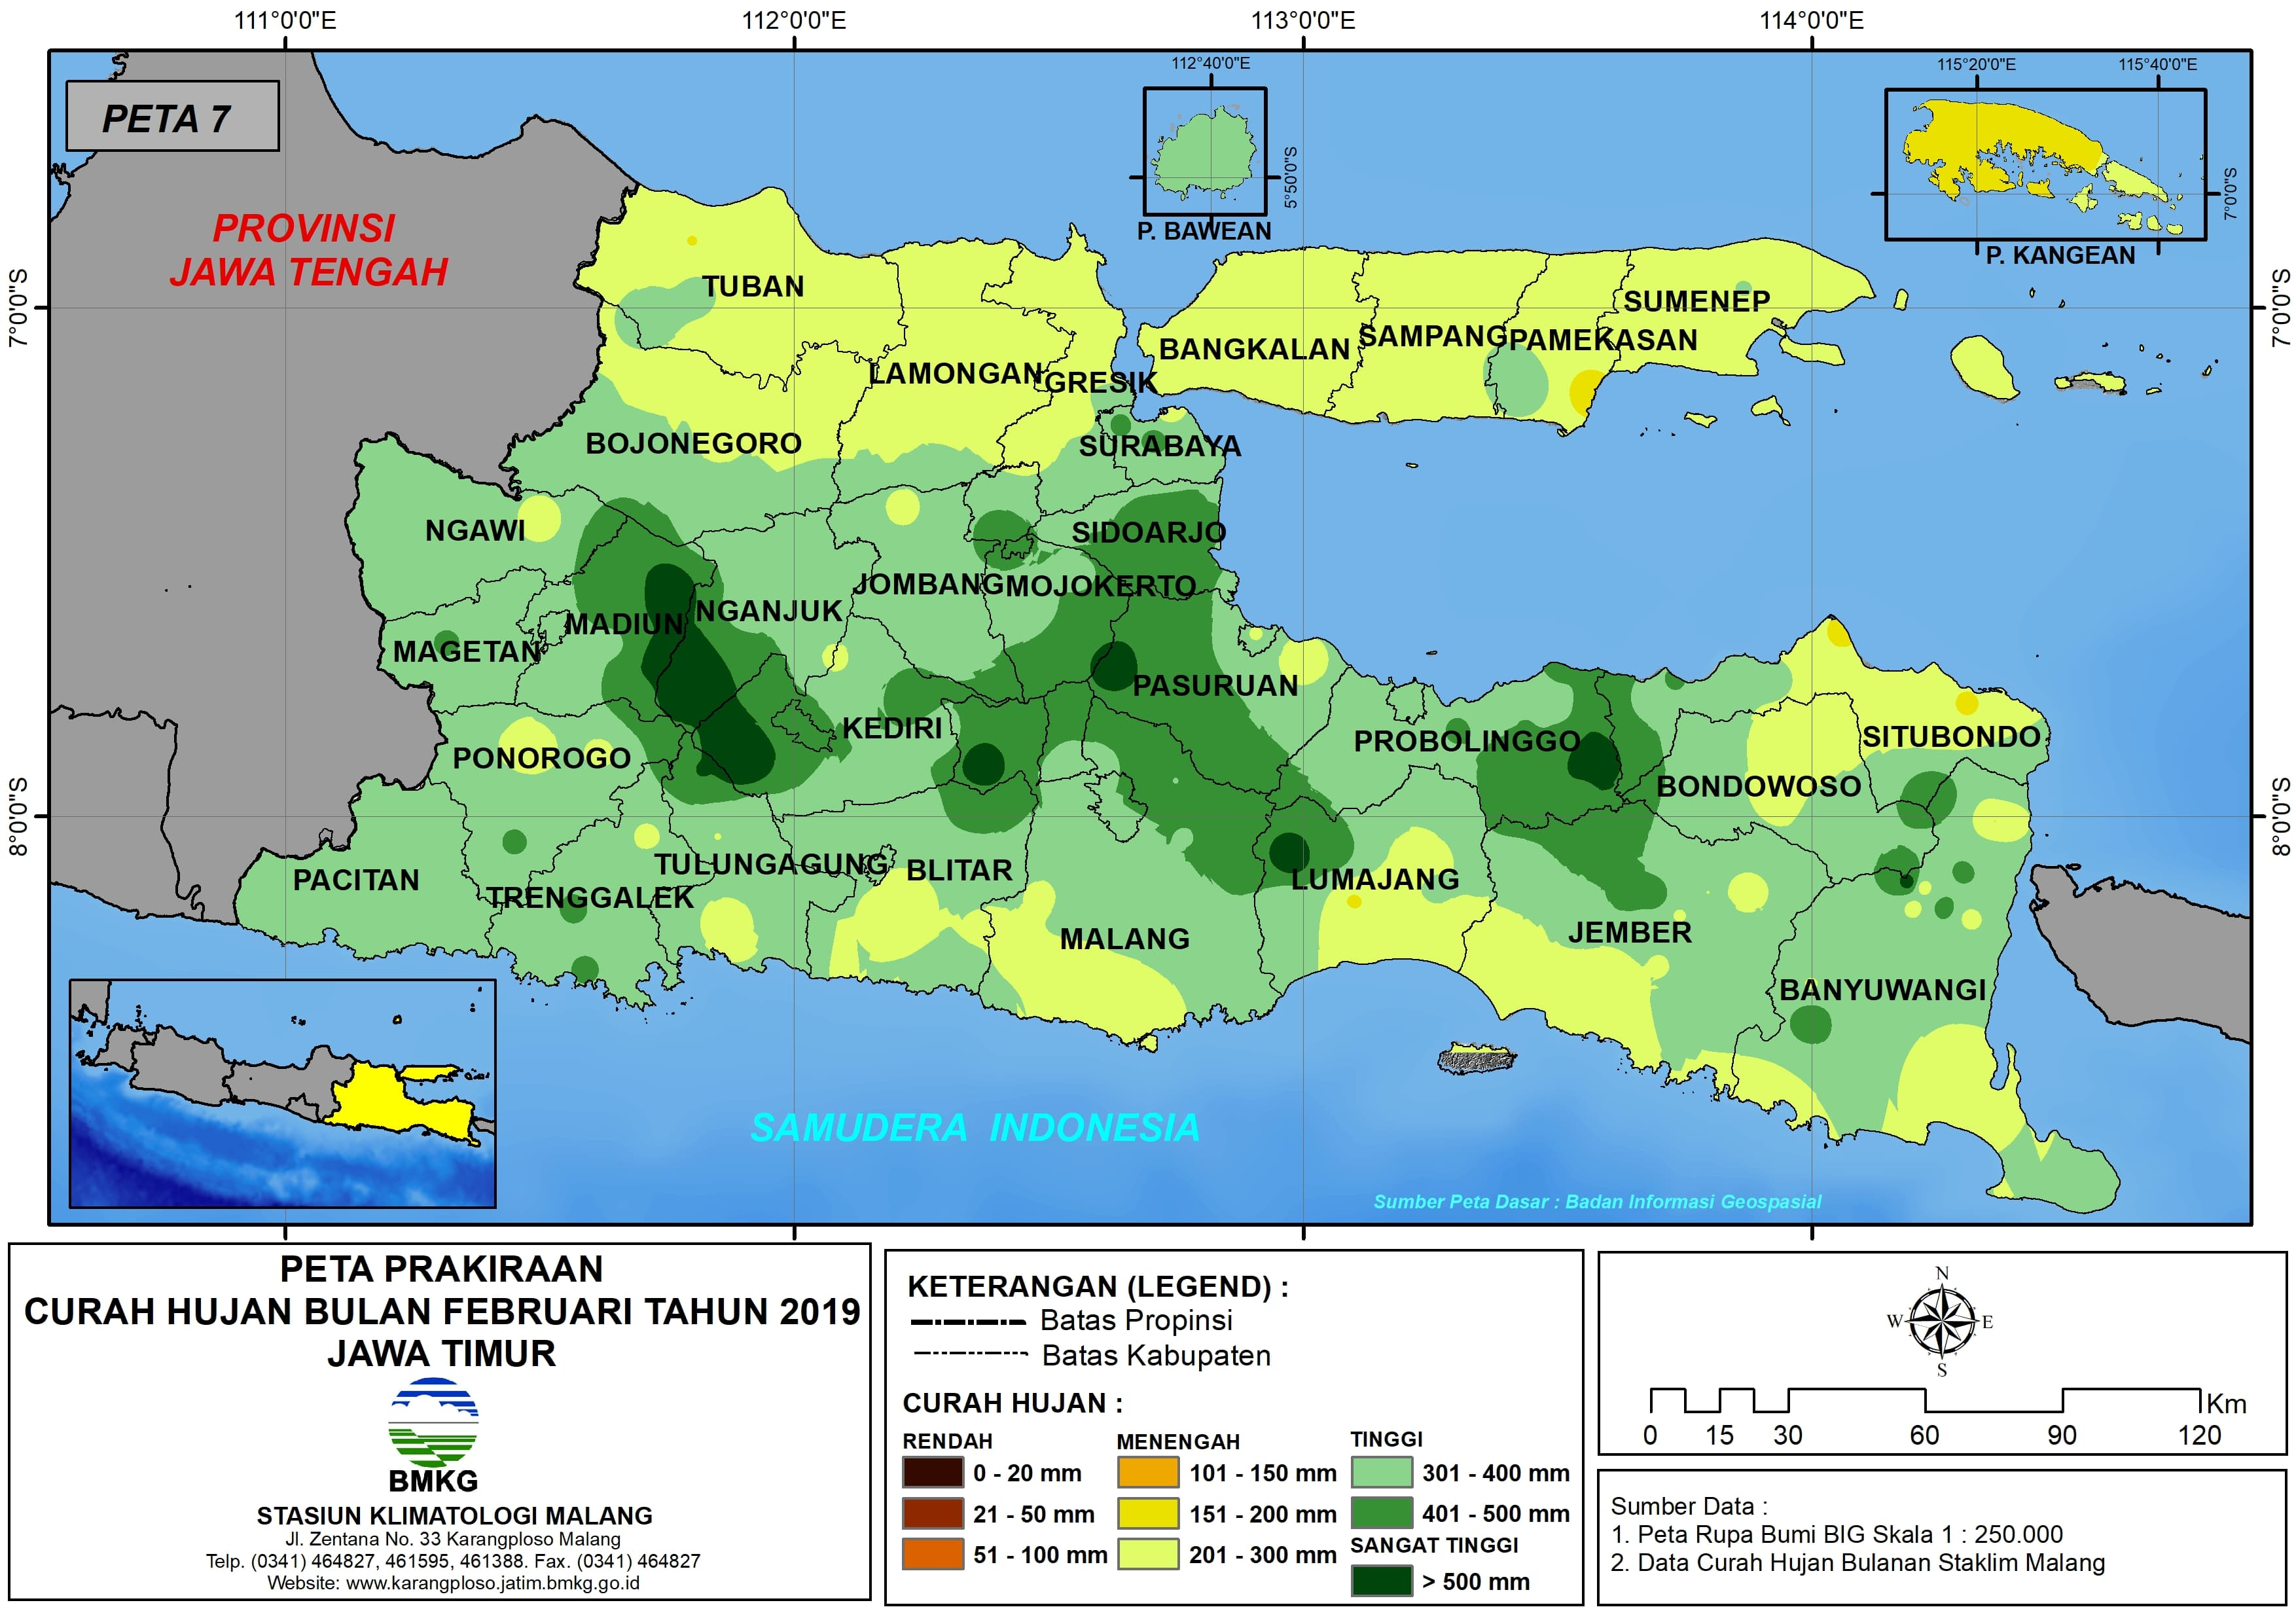 Prakiraan Curah Hujan Bulan Februari Tahun 2018 di Provinsi Jawa Timur Update dari Analisis Bulan November 2018